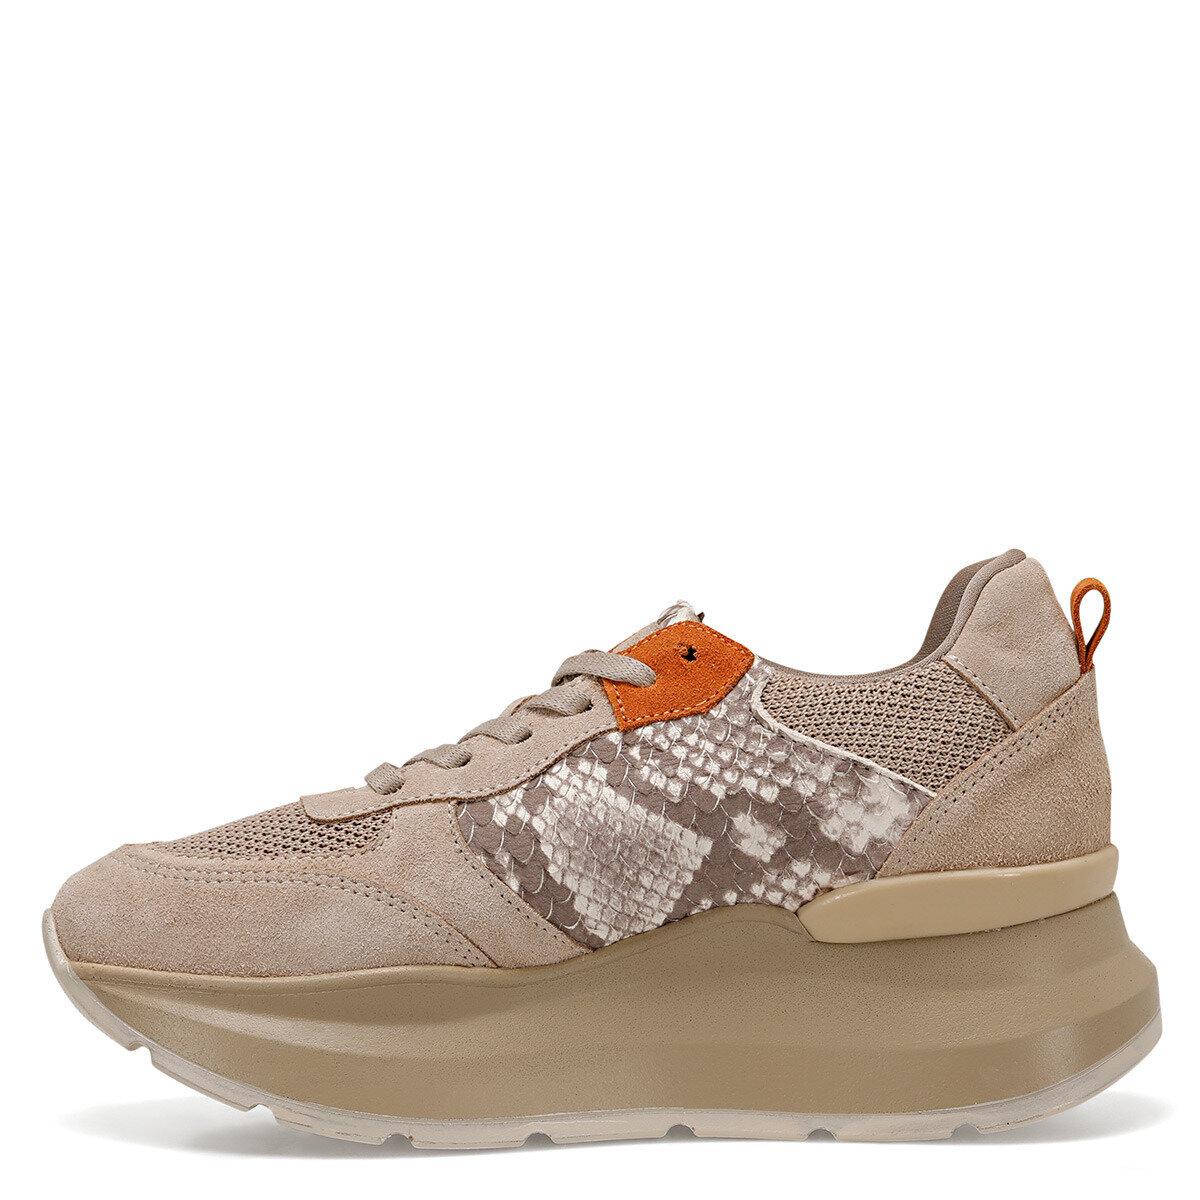 AMIA Bej Kadın Sneaker